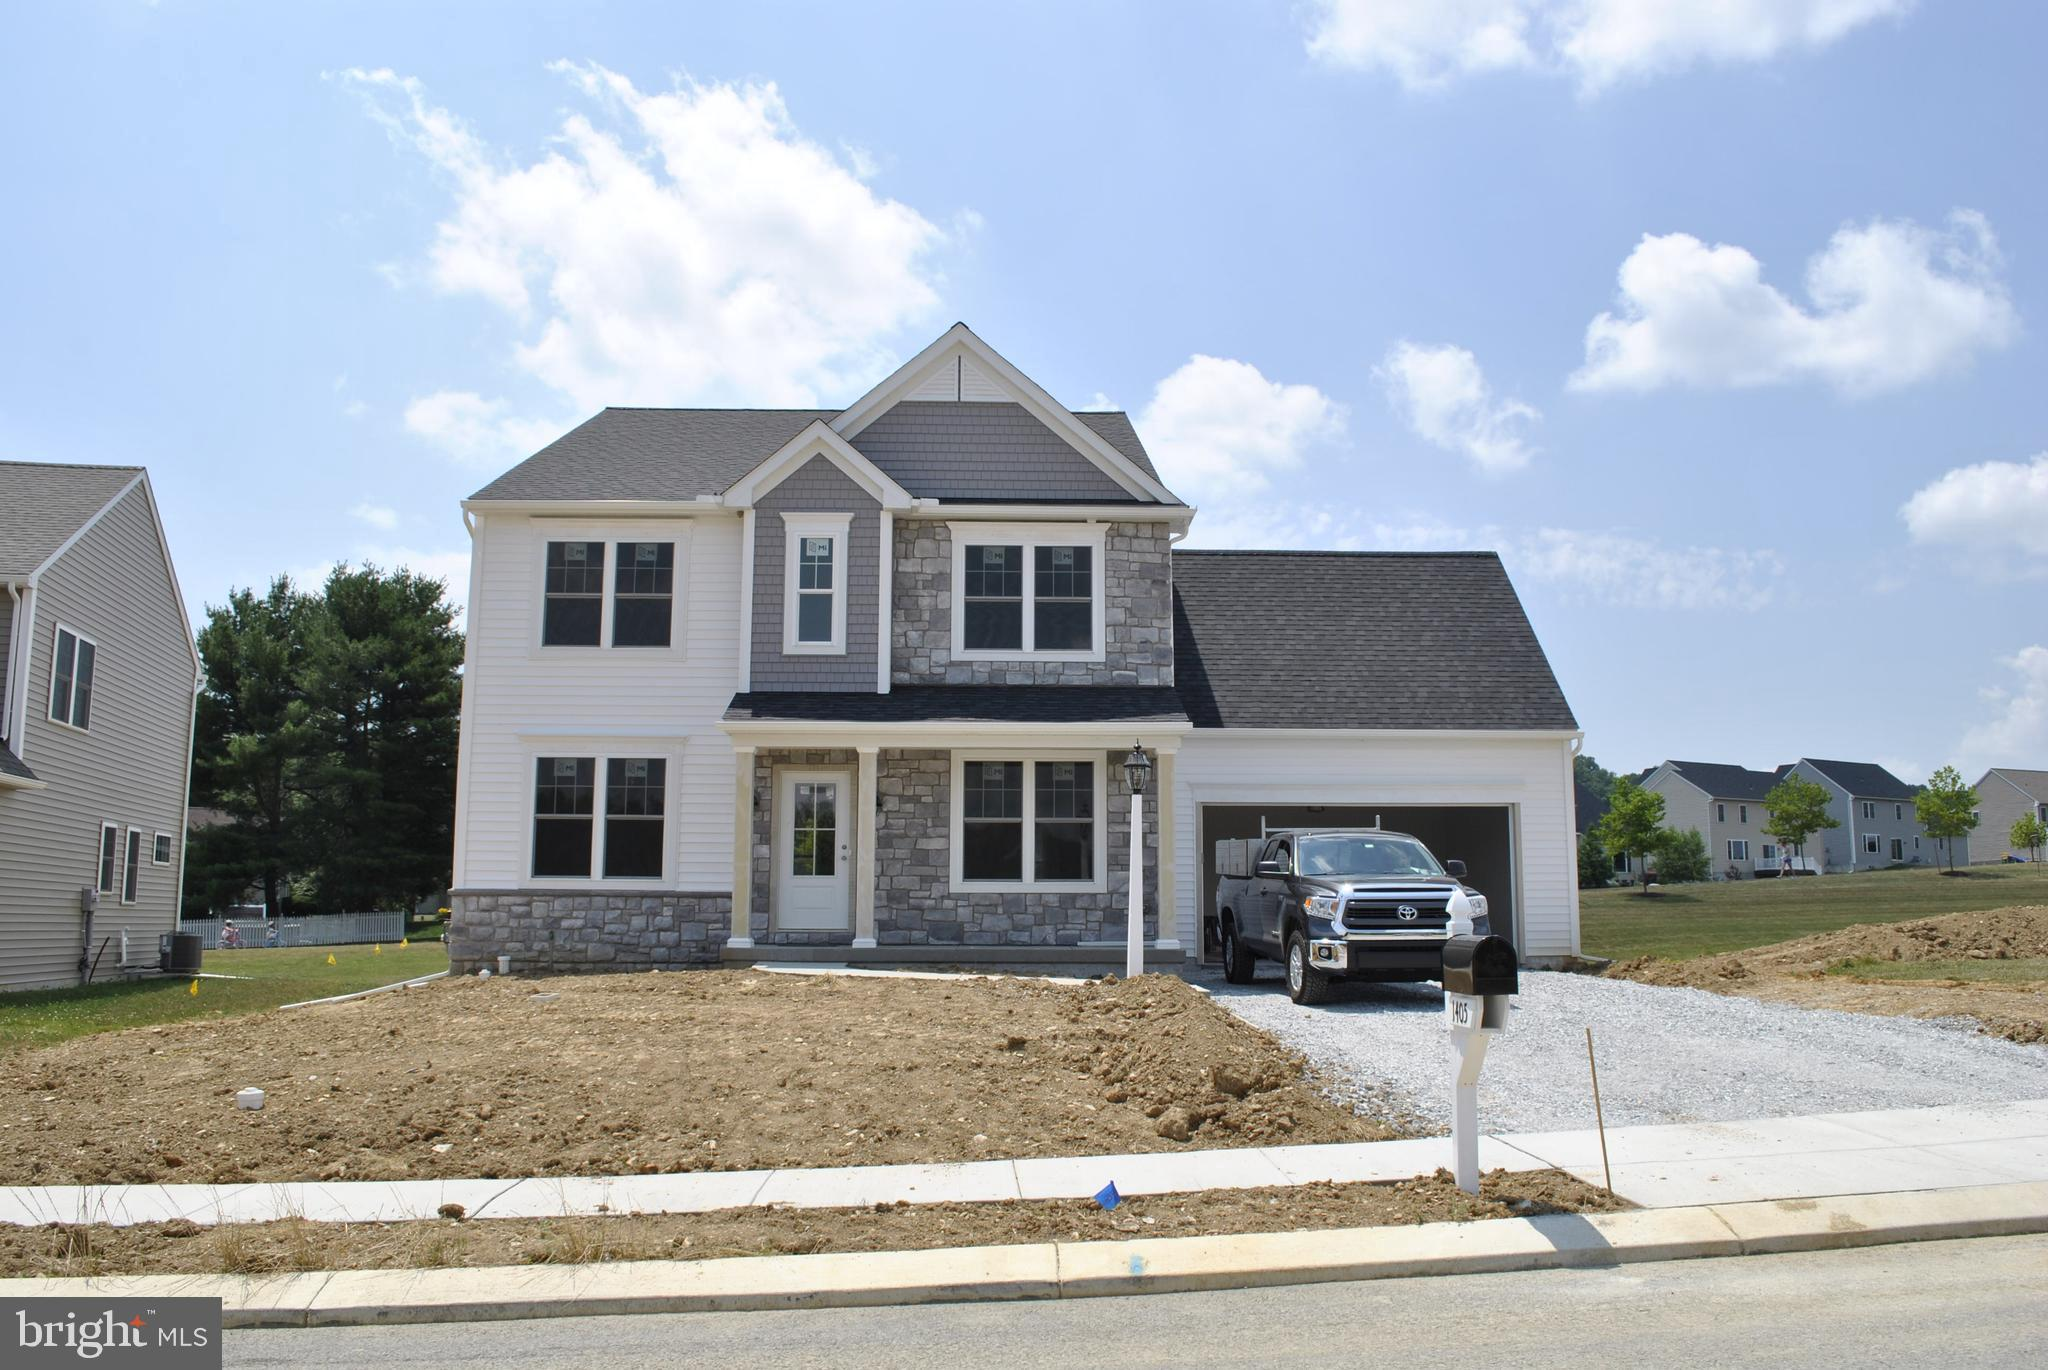 1405 Windemere Lane, Landisville, PA 17538